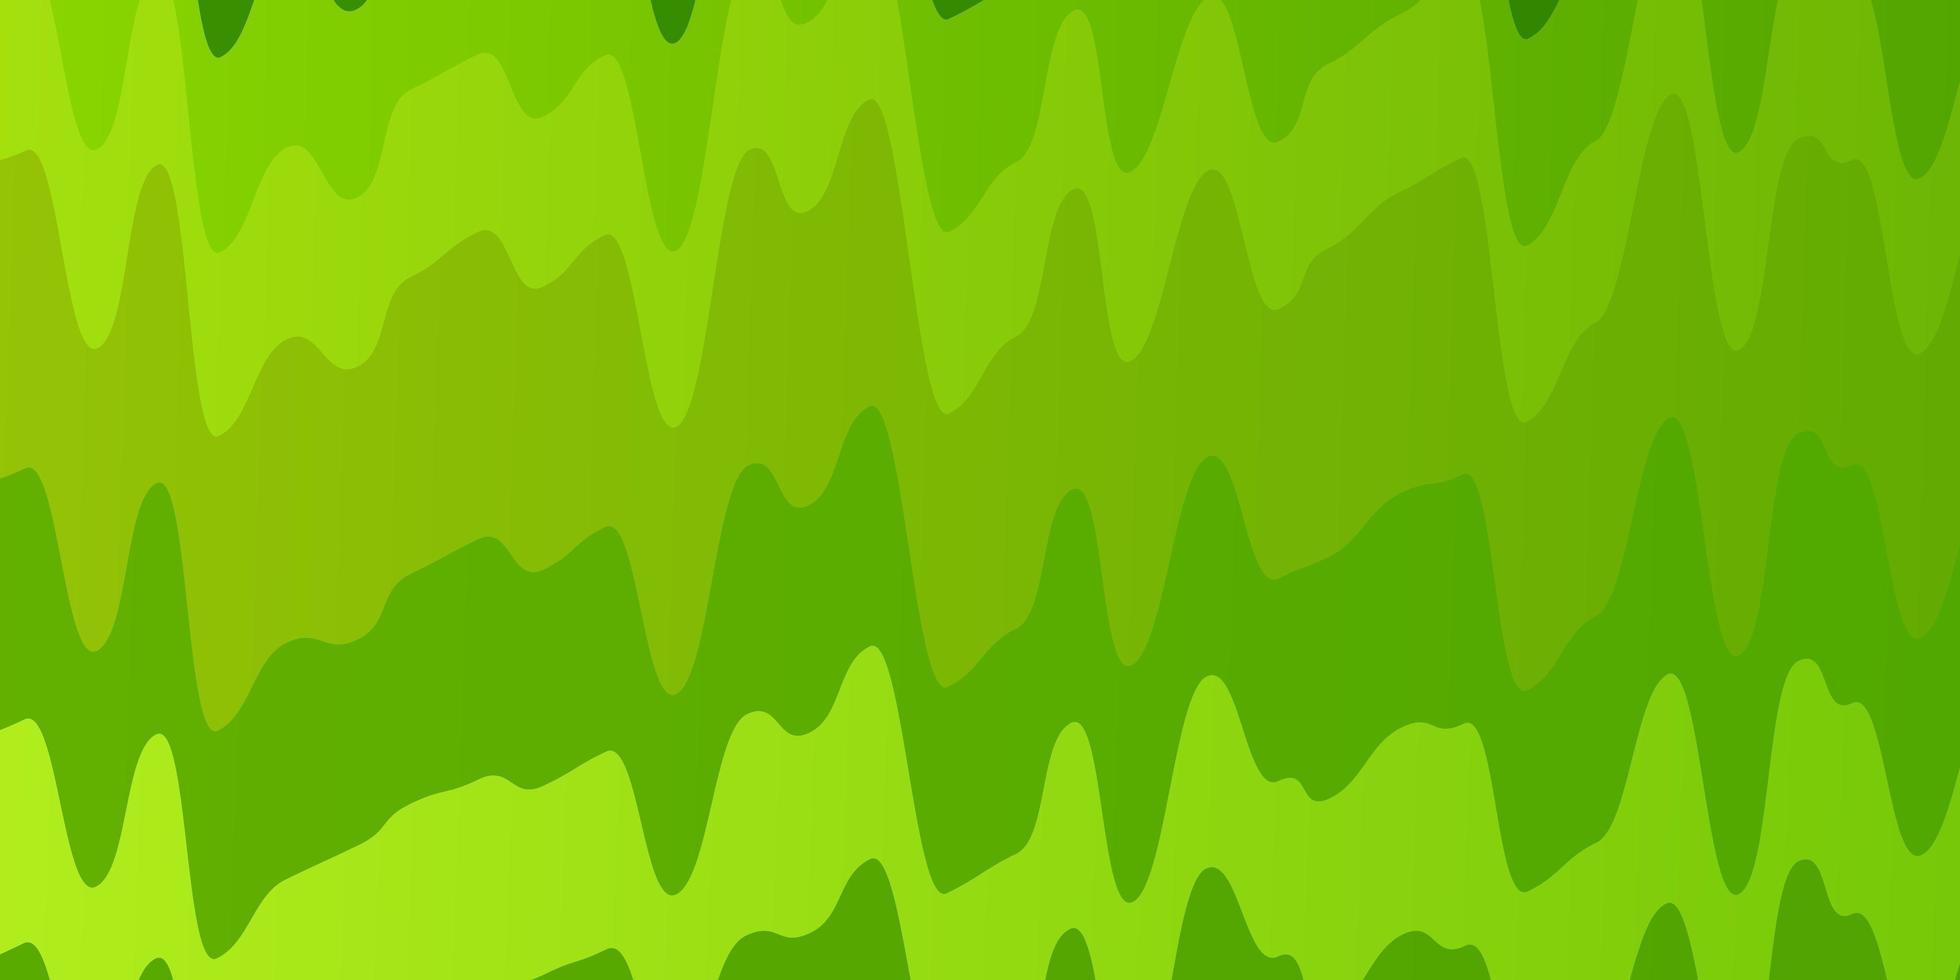 fondo verde con líneas dobladas. vector